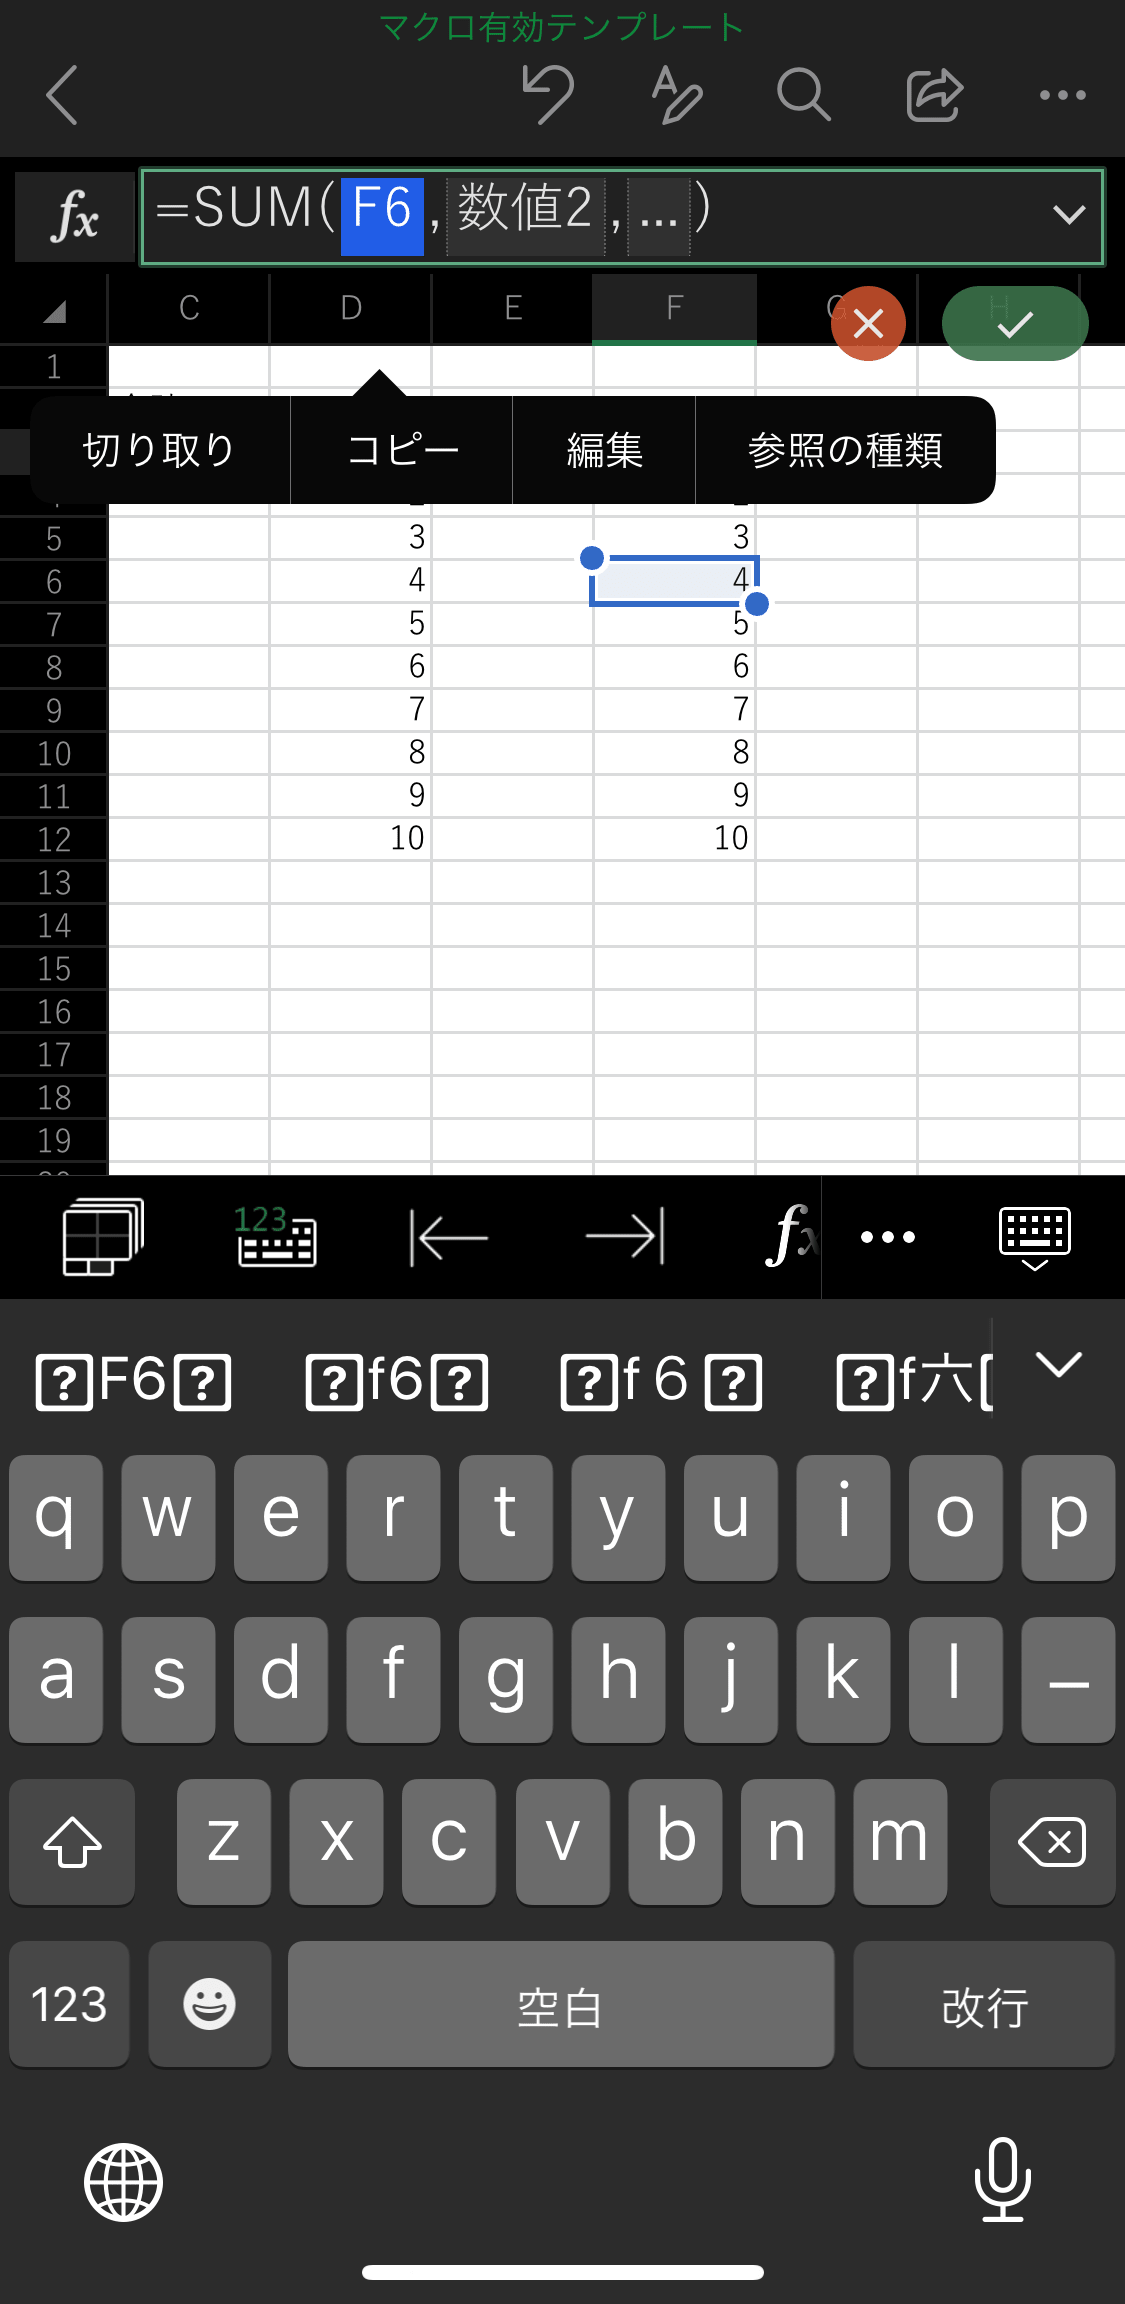 iPhoneでのエクセルアプリの使い方・編集方法・保存方法3